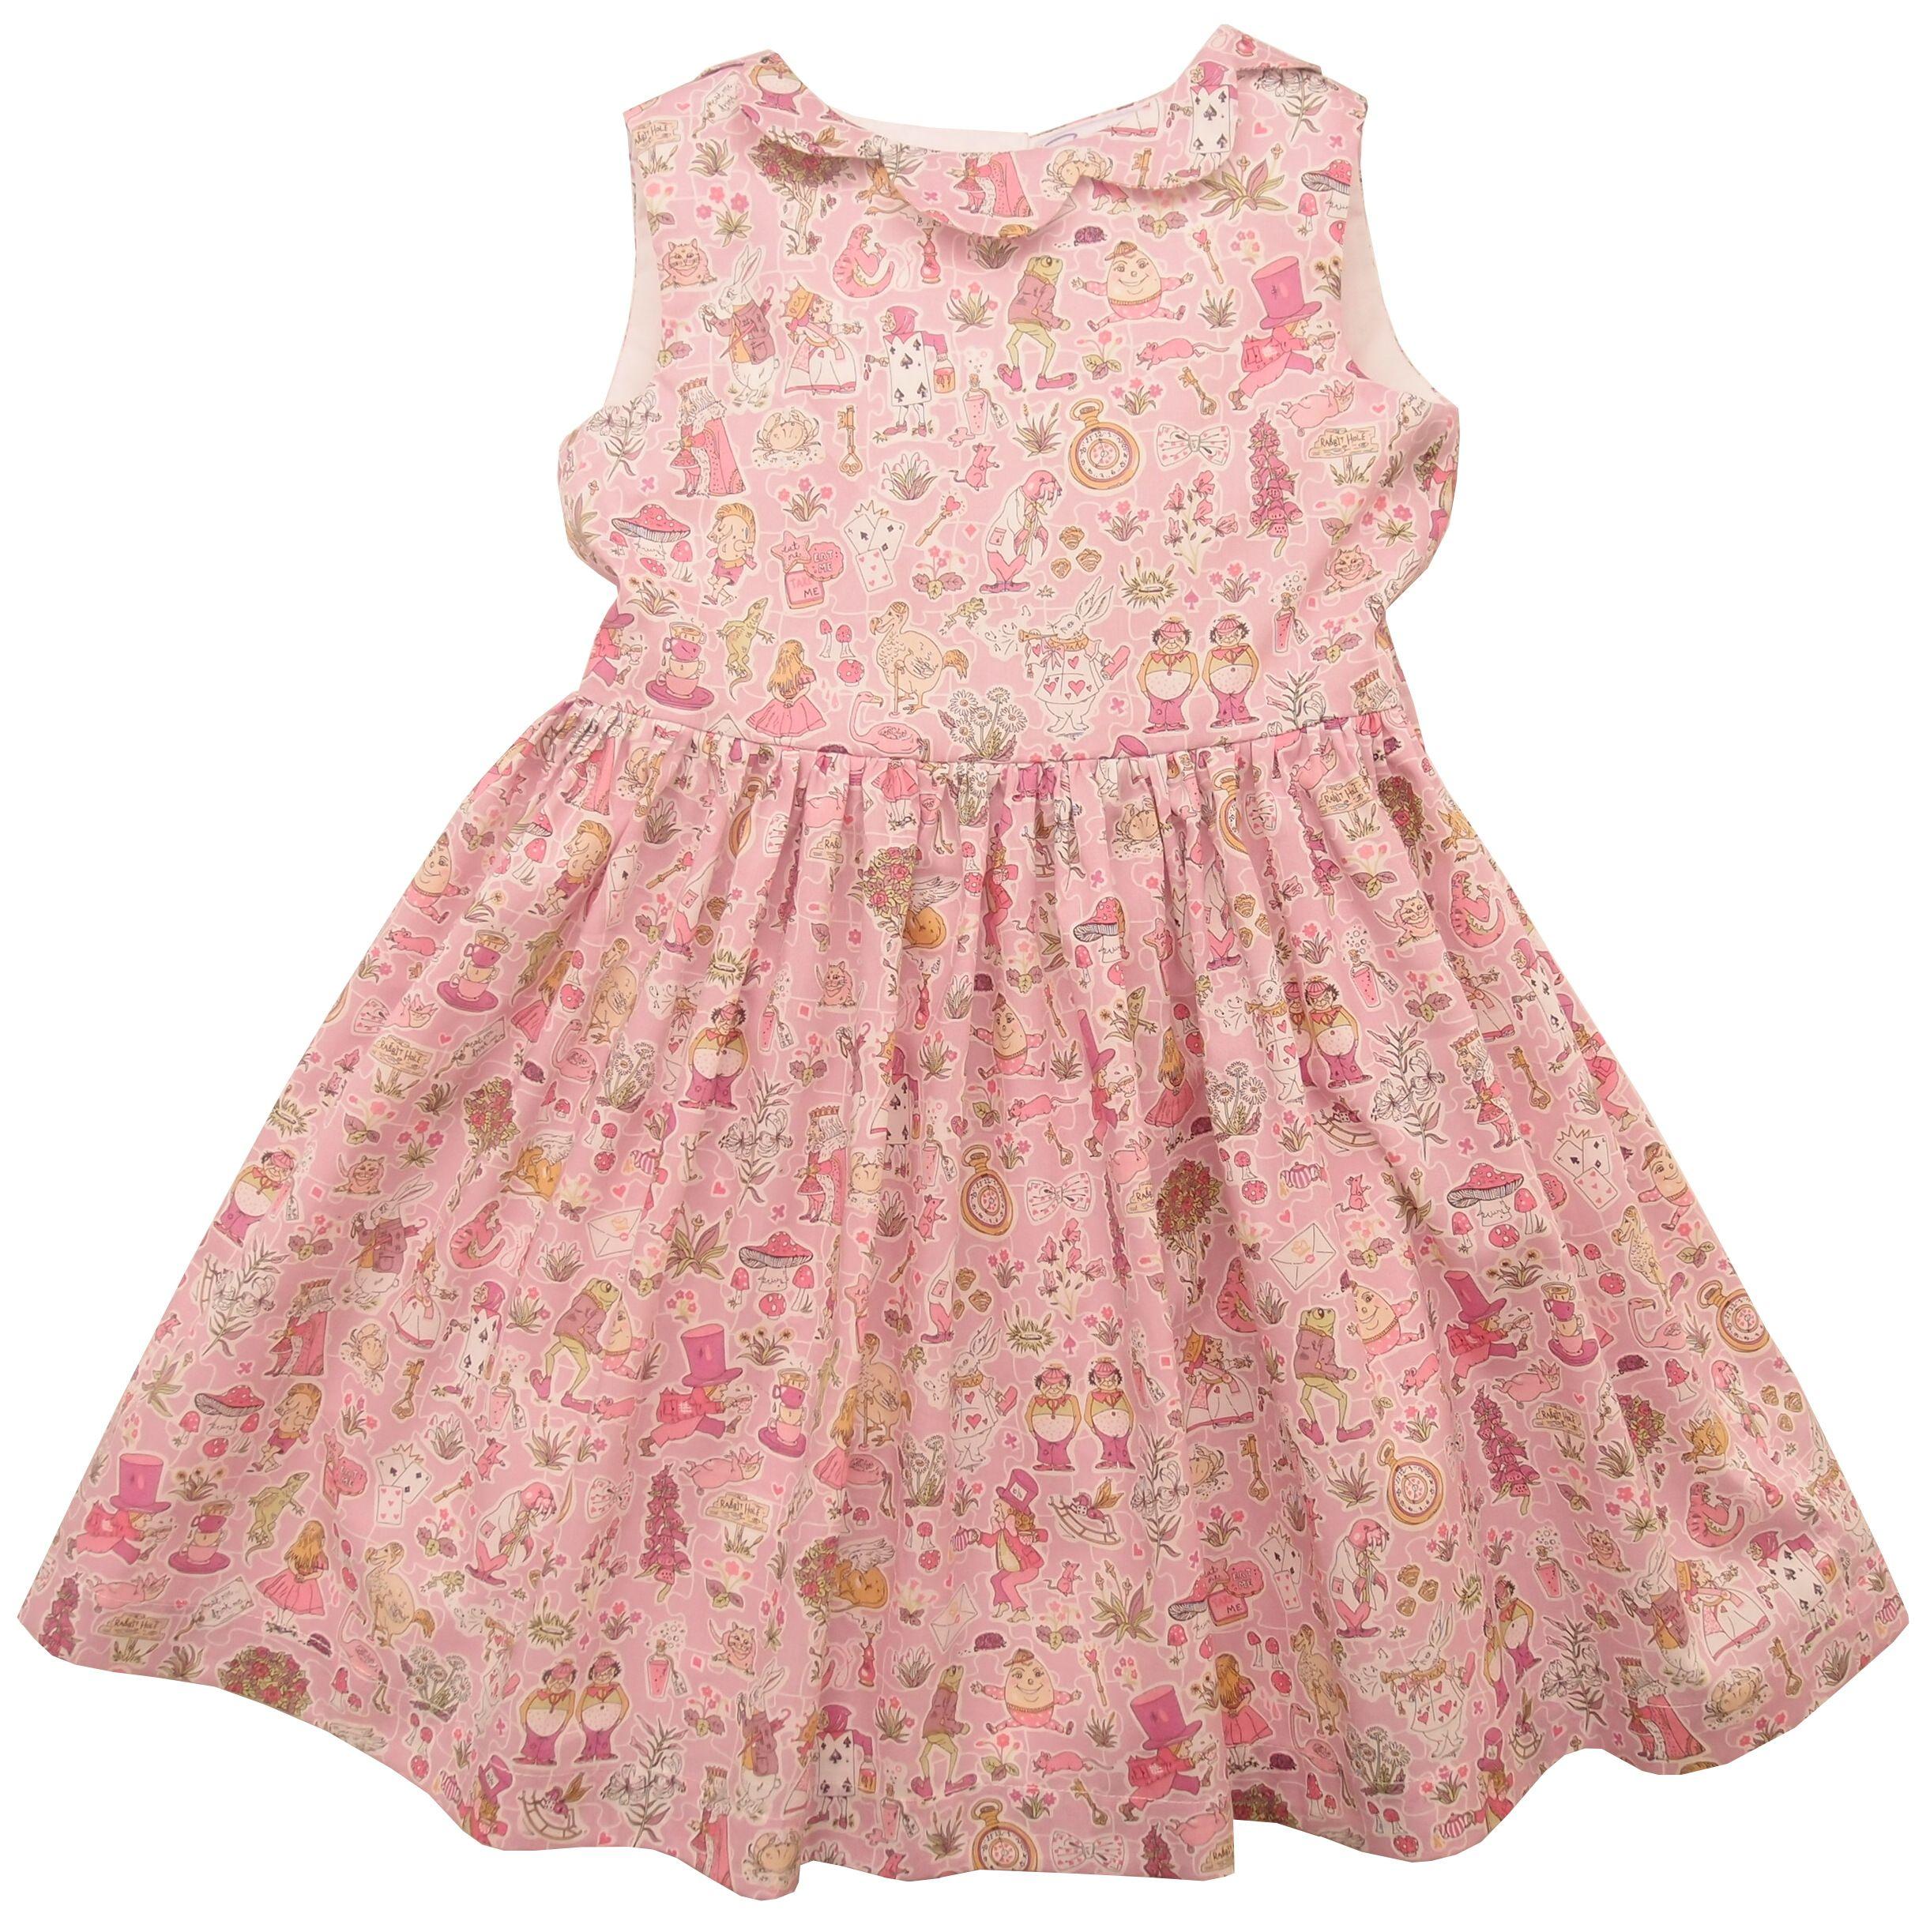 Girls Liberty Print Alice in Wonderment dress - Gallymoggers #SS15 ...